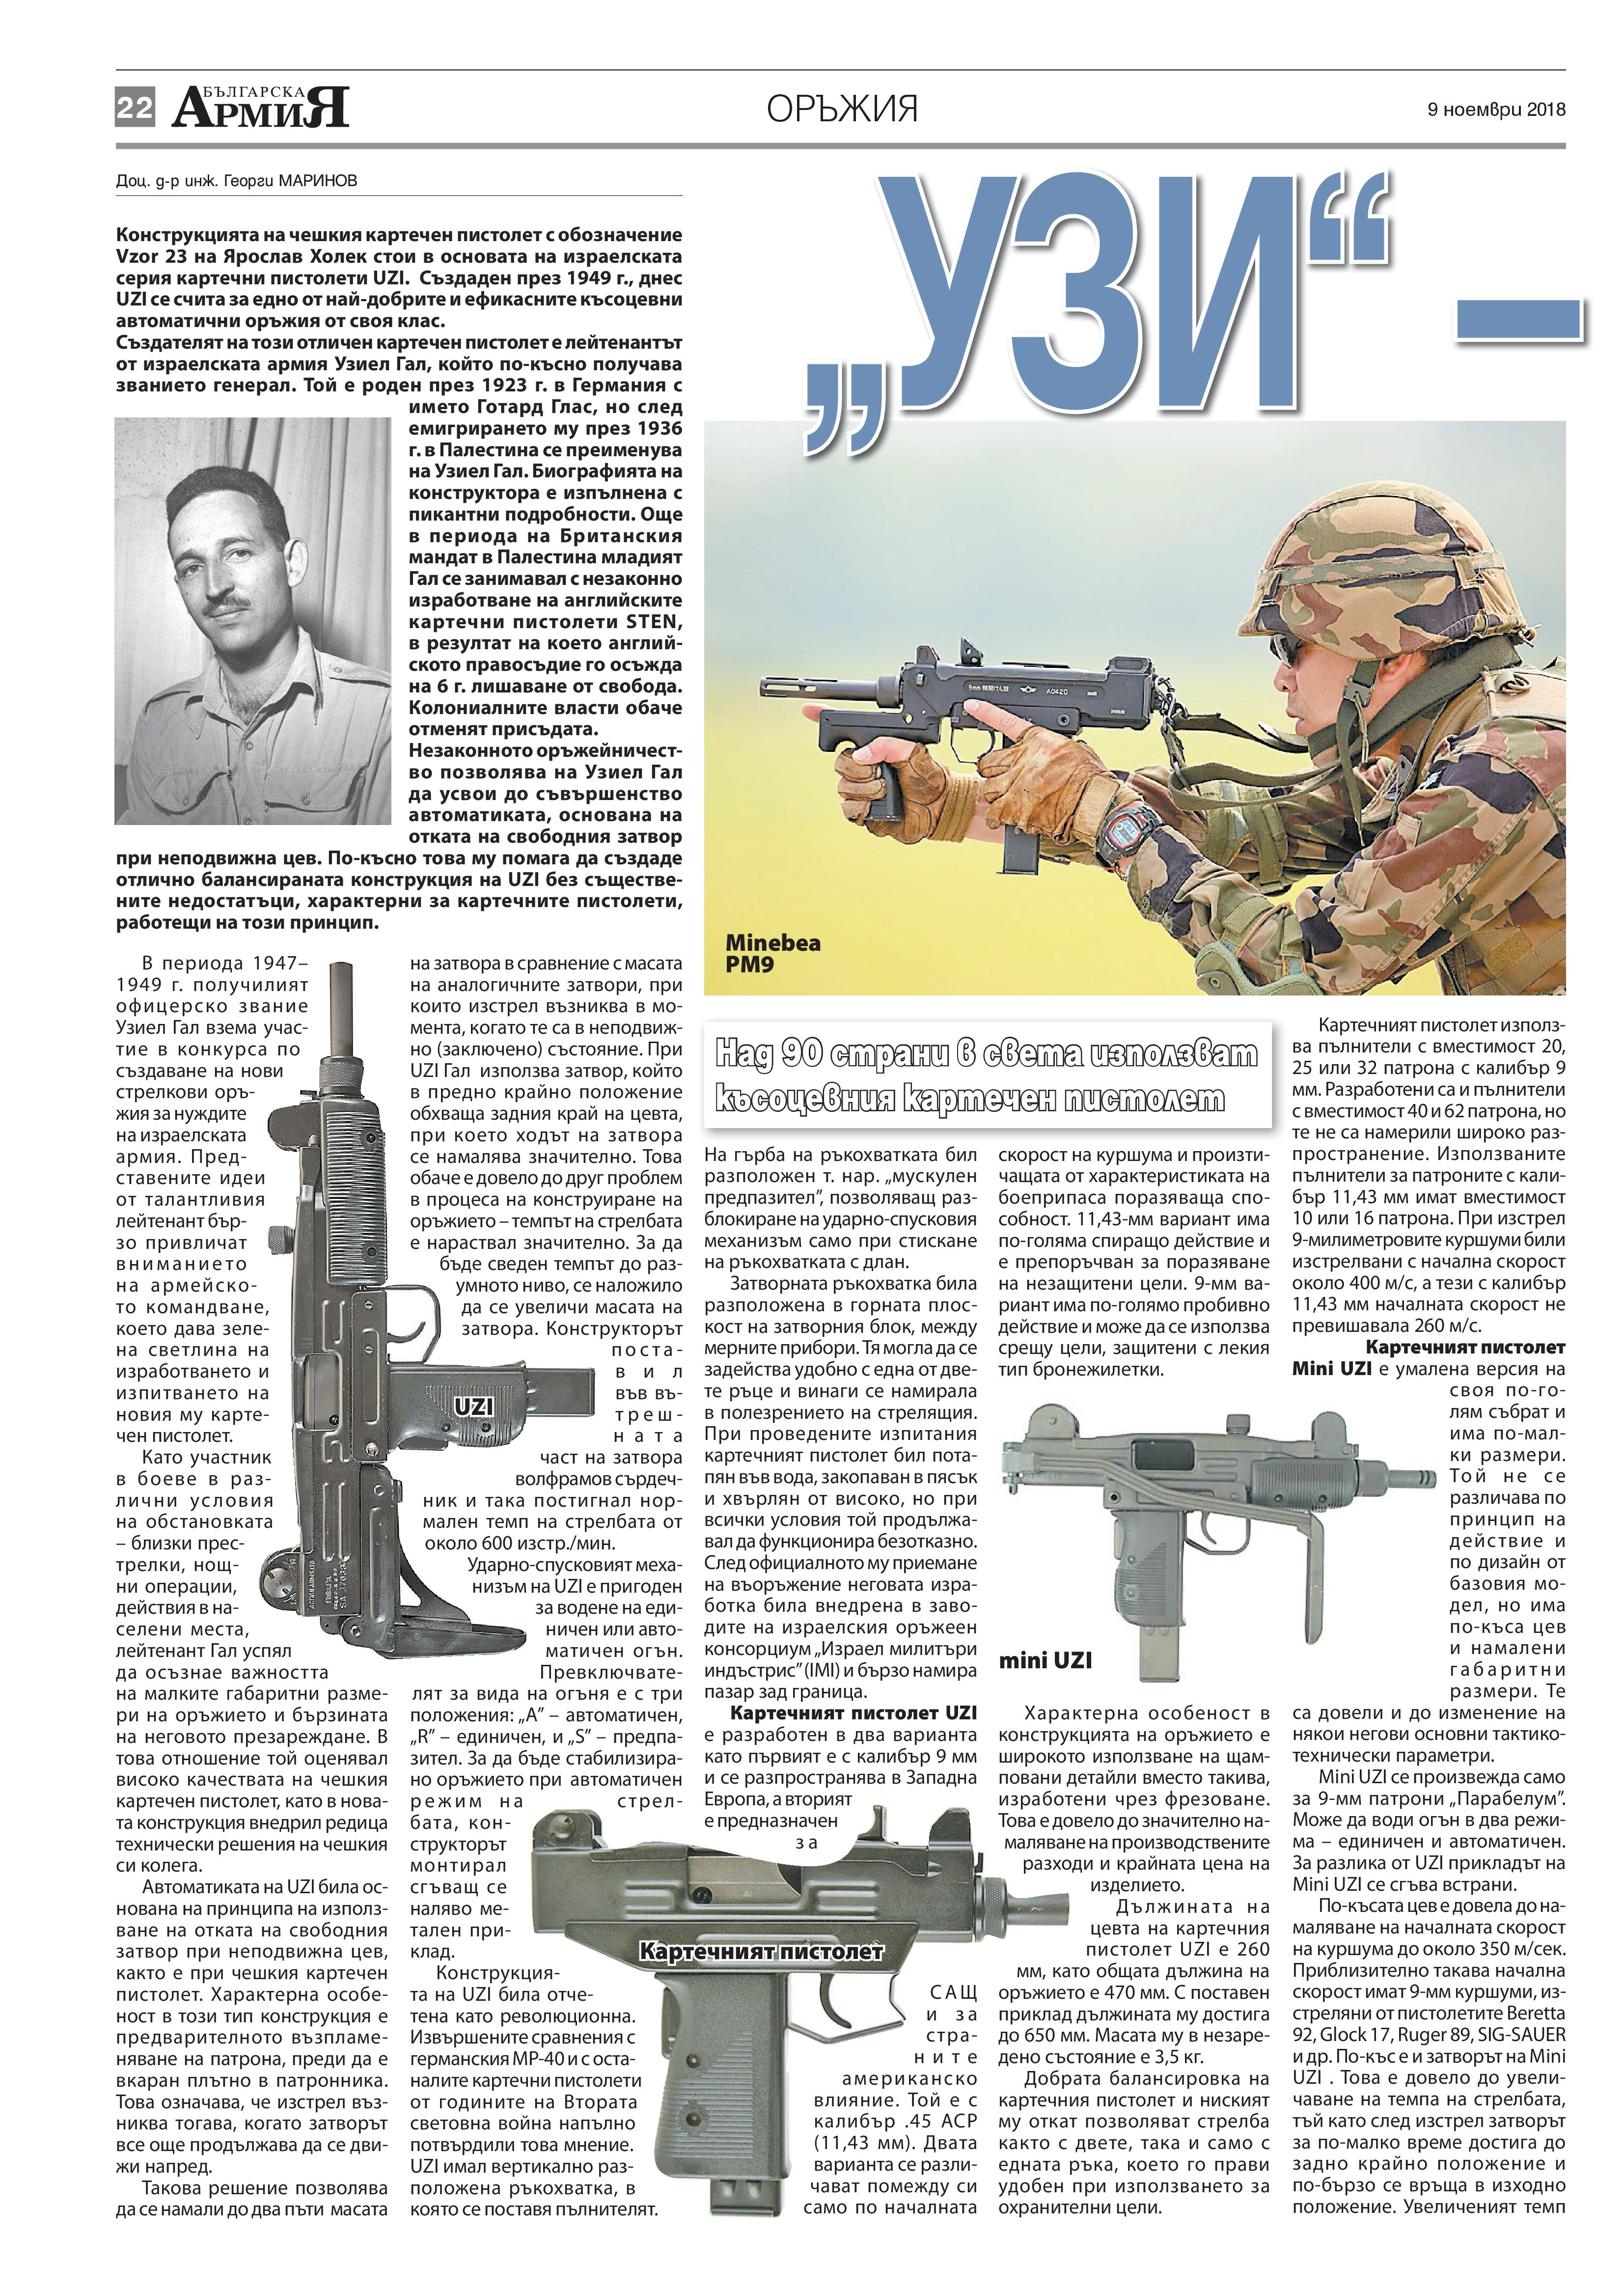 https://armymedia.bg/wp-content/uploads/2015/06/22-25.jpg